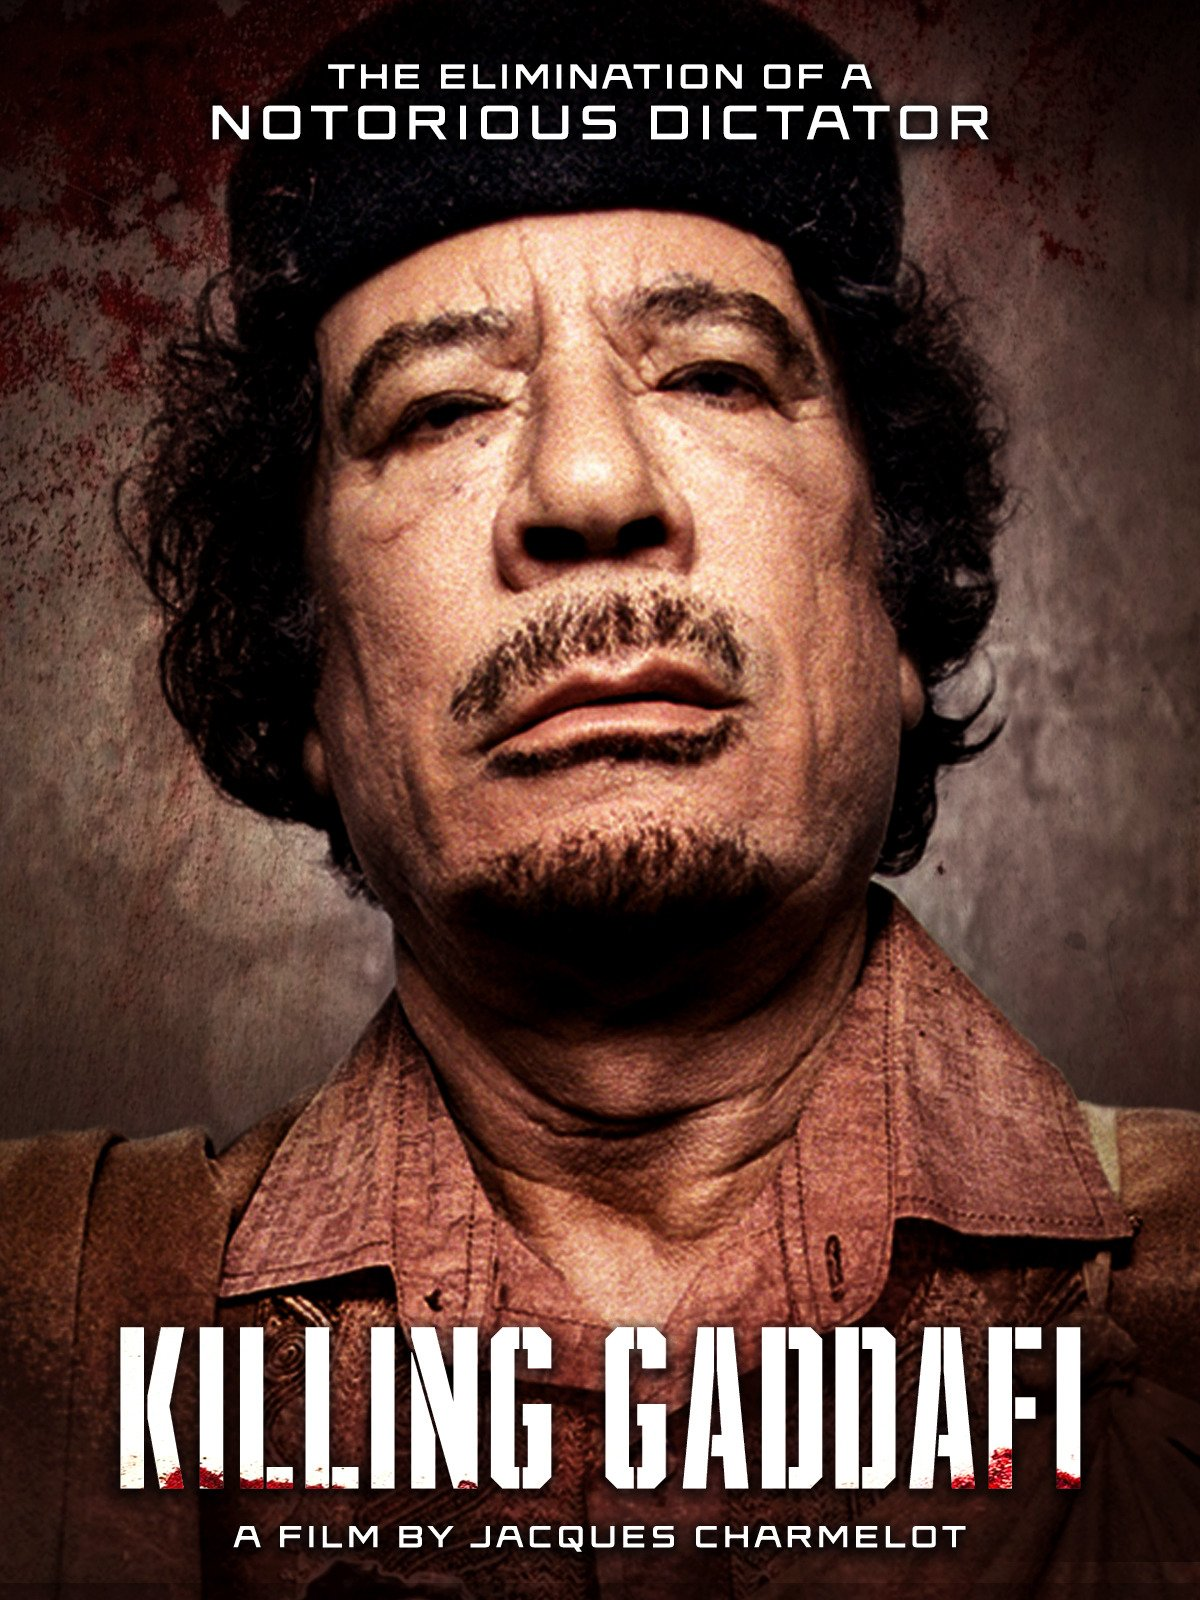 Killing Gaddafi